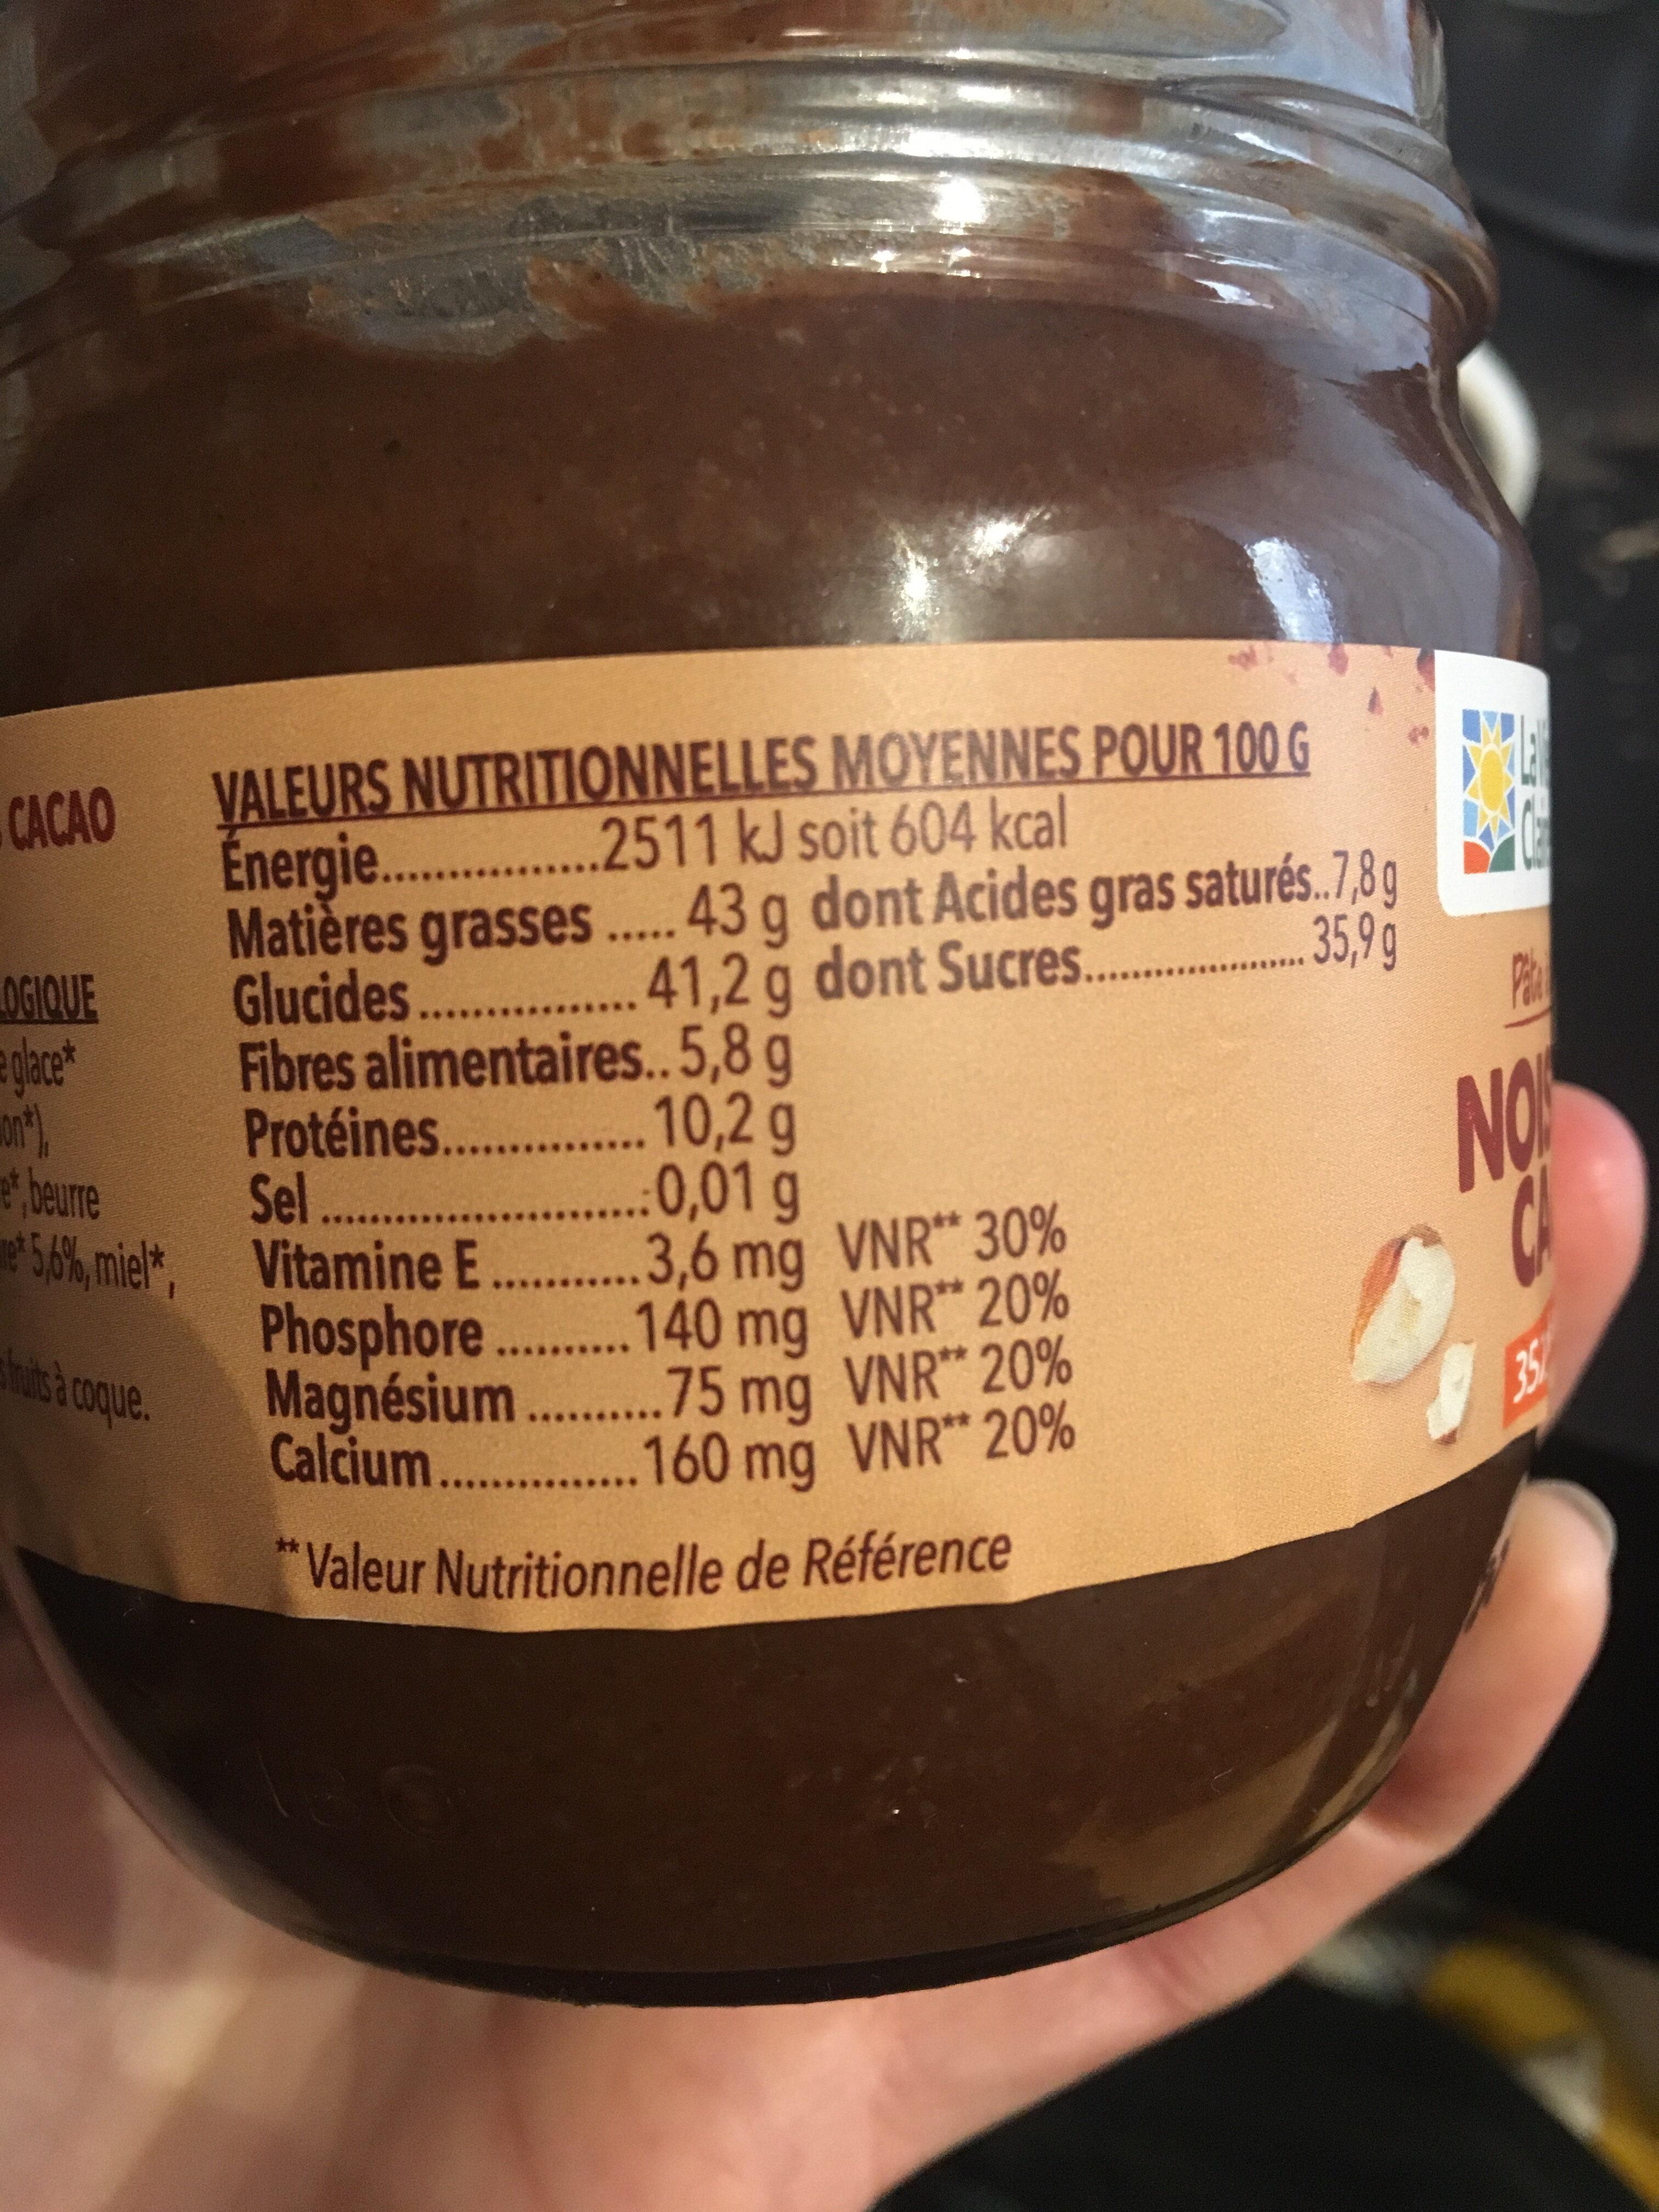 Pate à tartiner Noisette Cacao - Informations nutritionnelles - fr